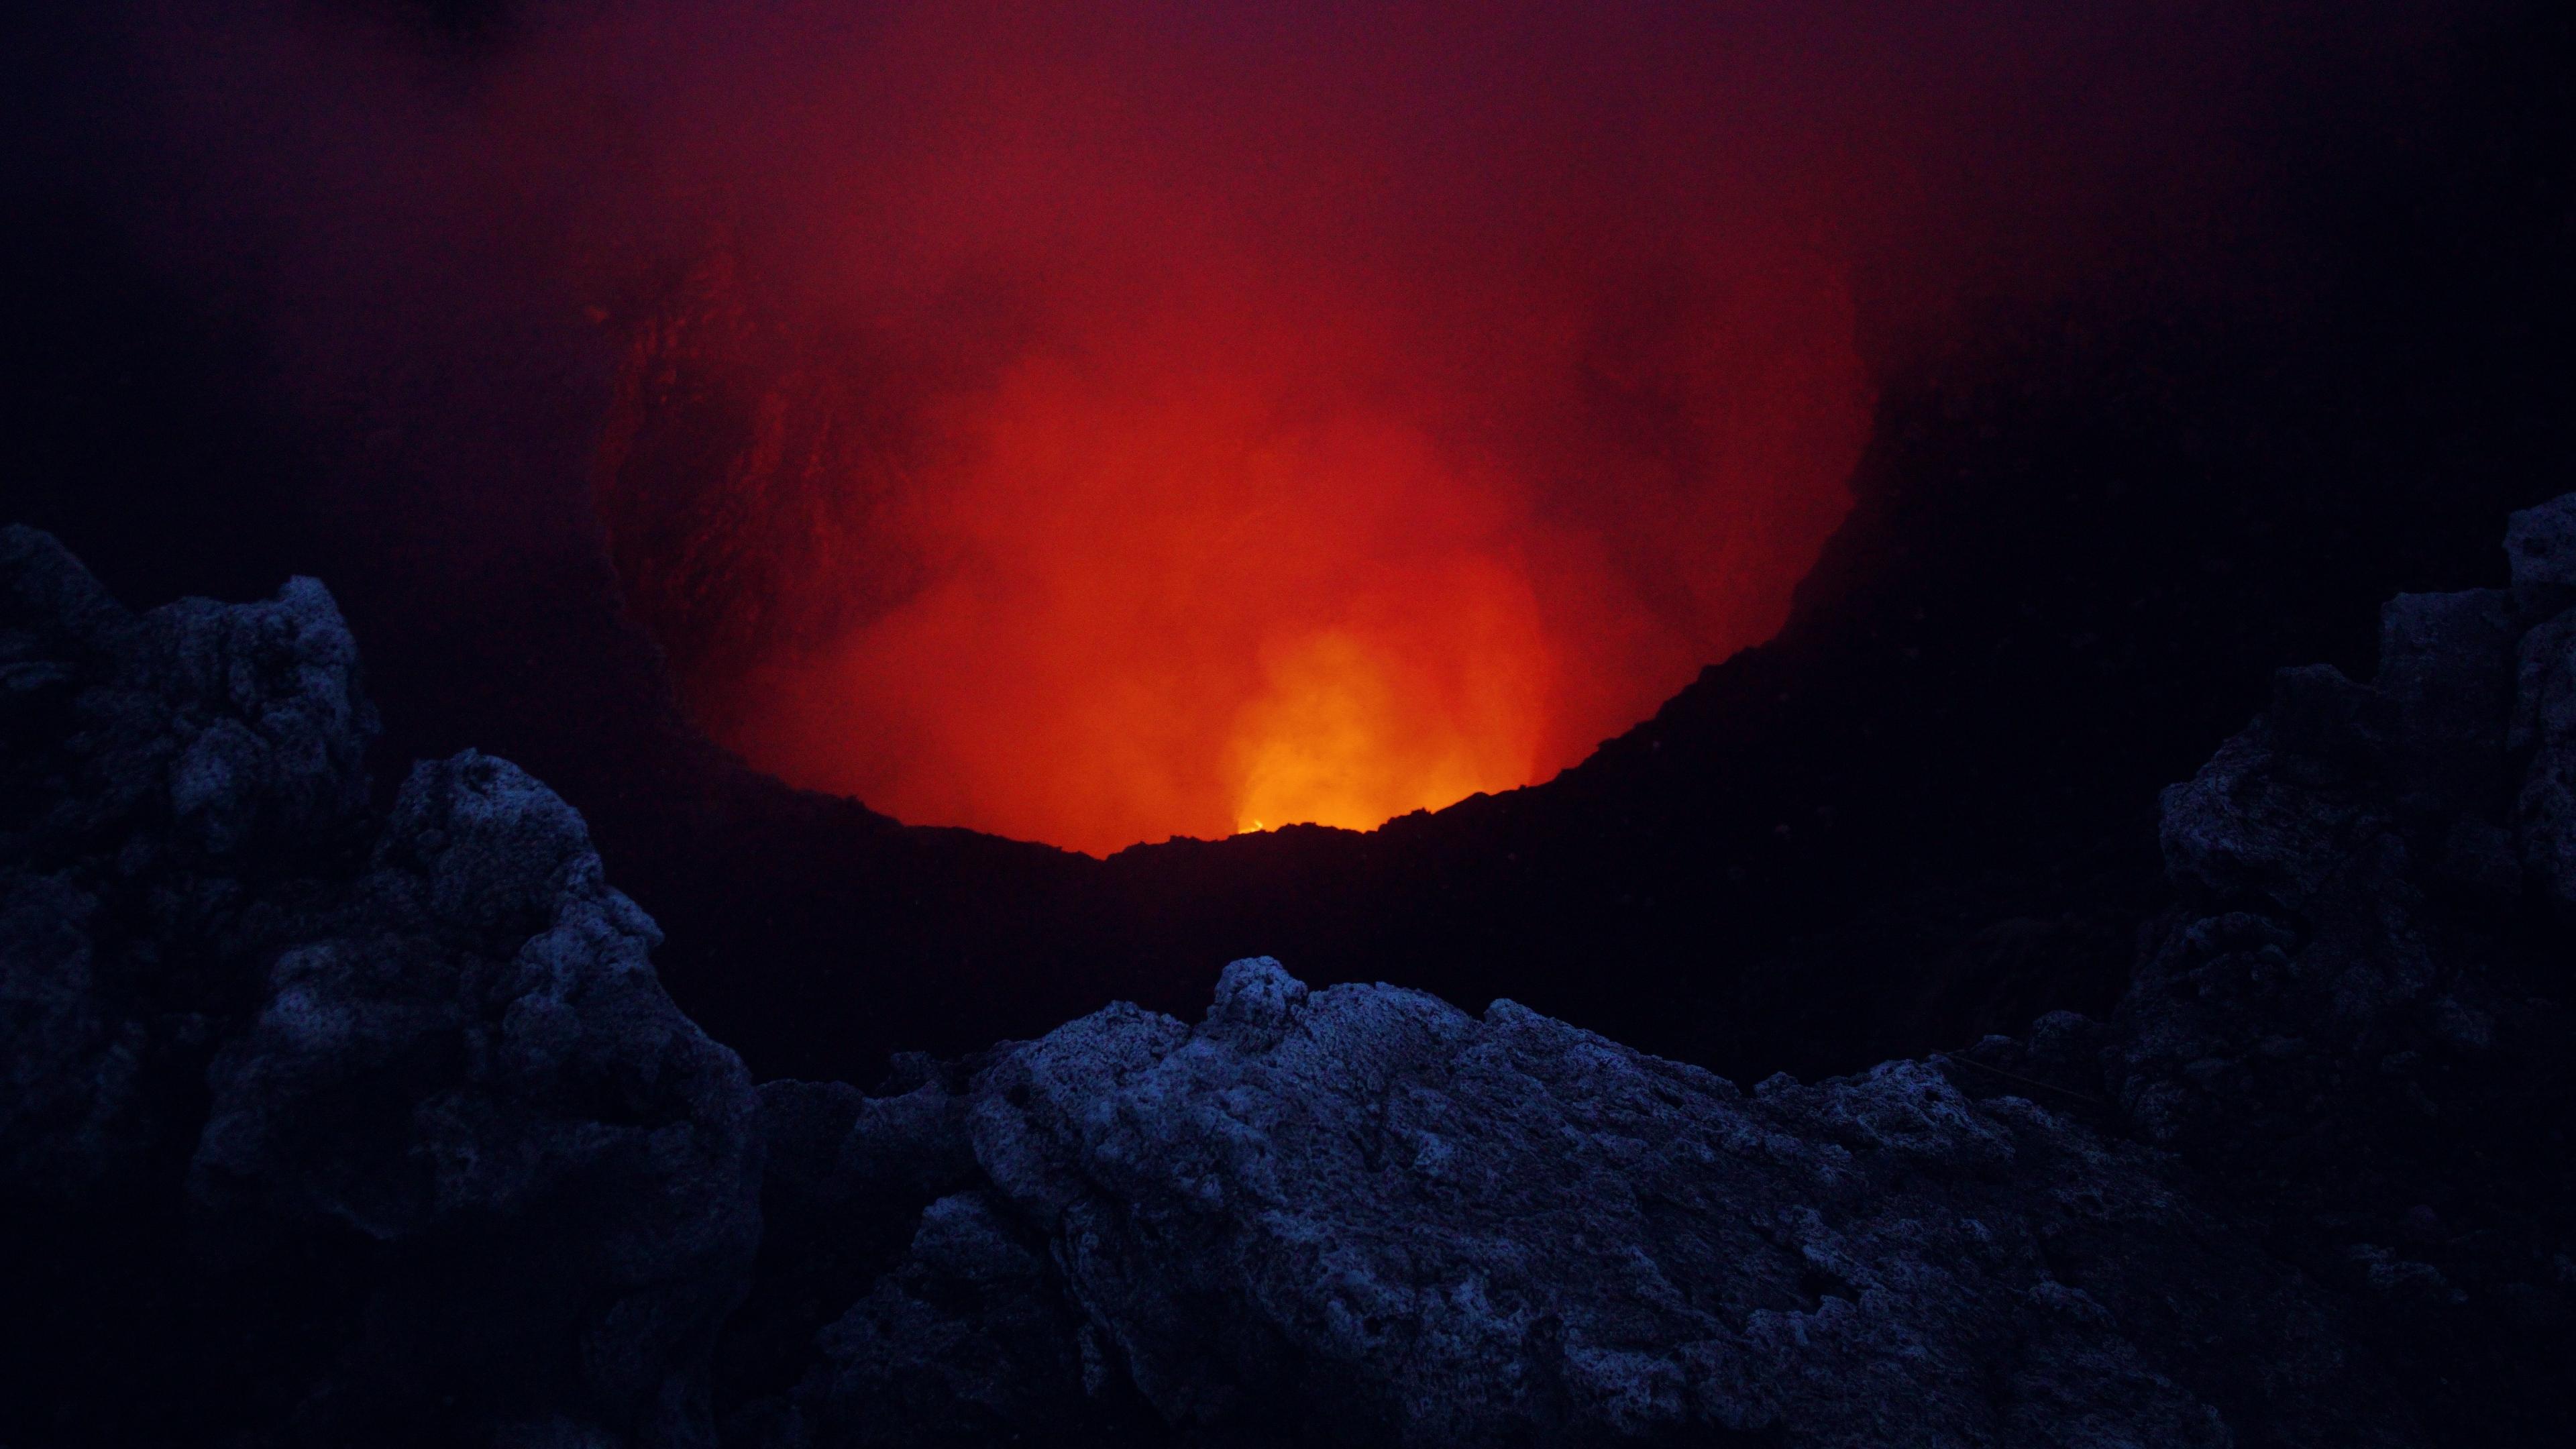 Volcano Dark Red 4k, HD Nature, 4k Wallpapers, Images ...